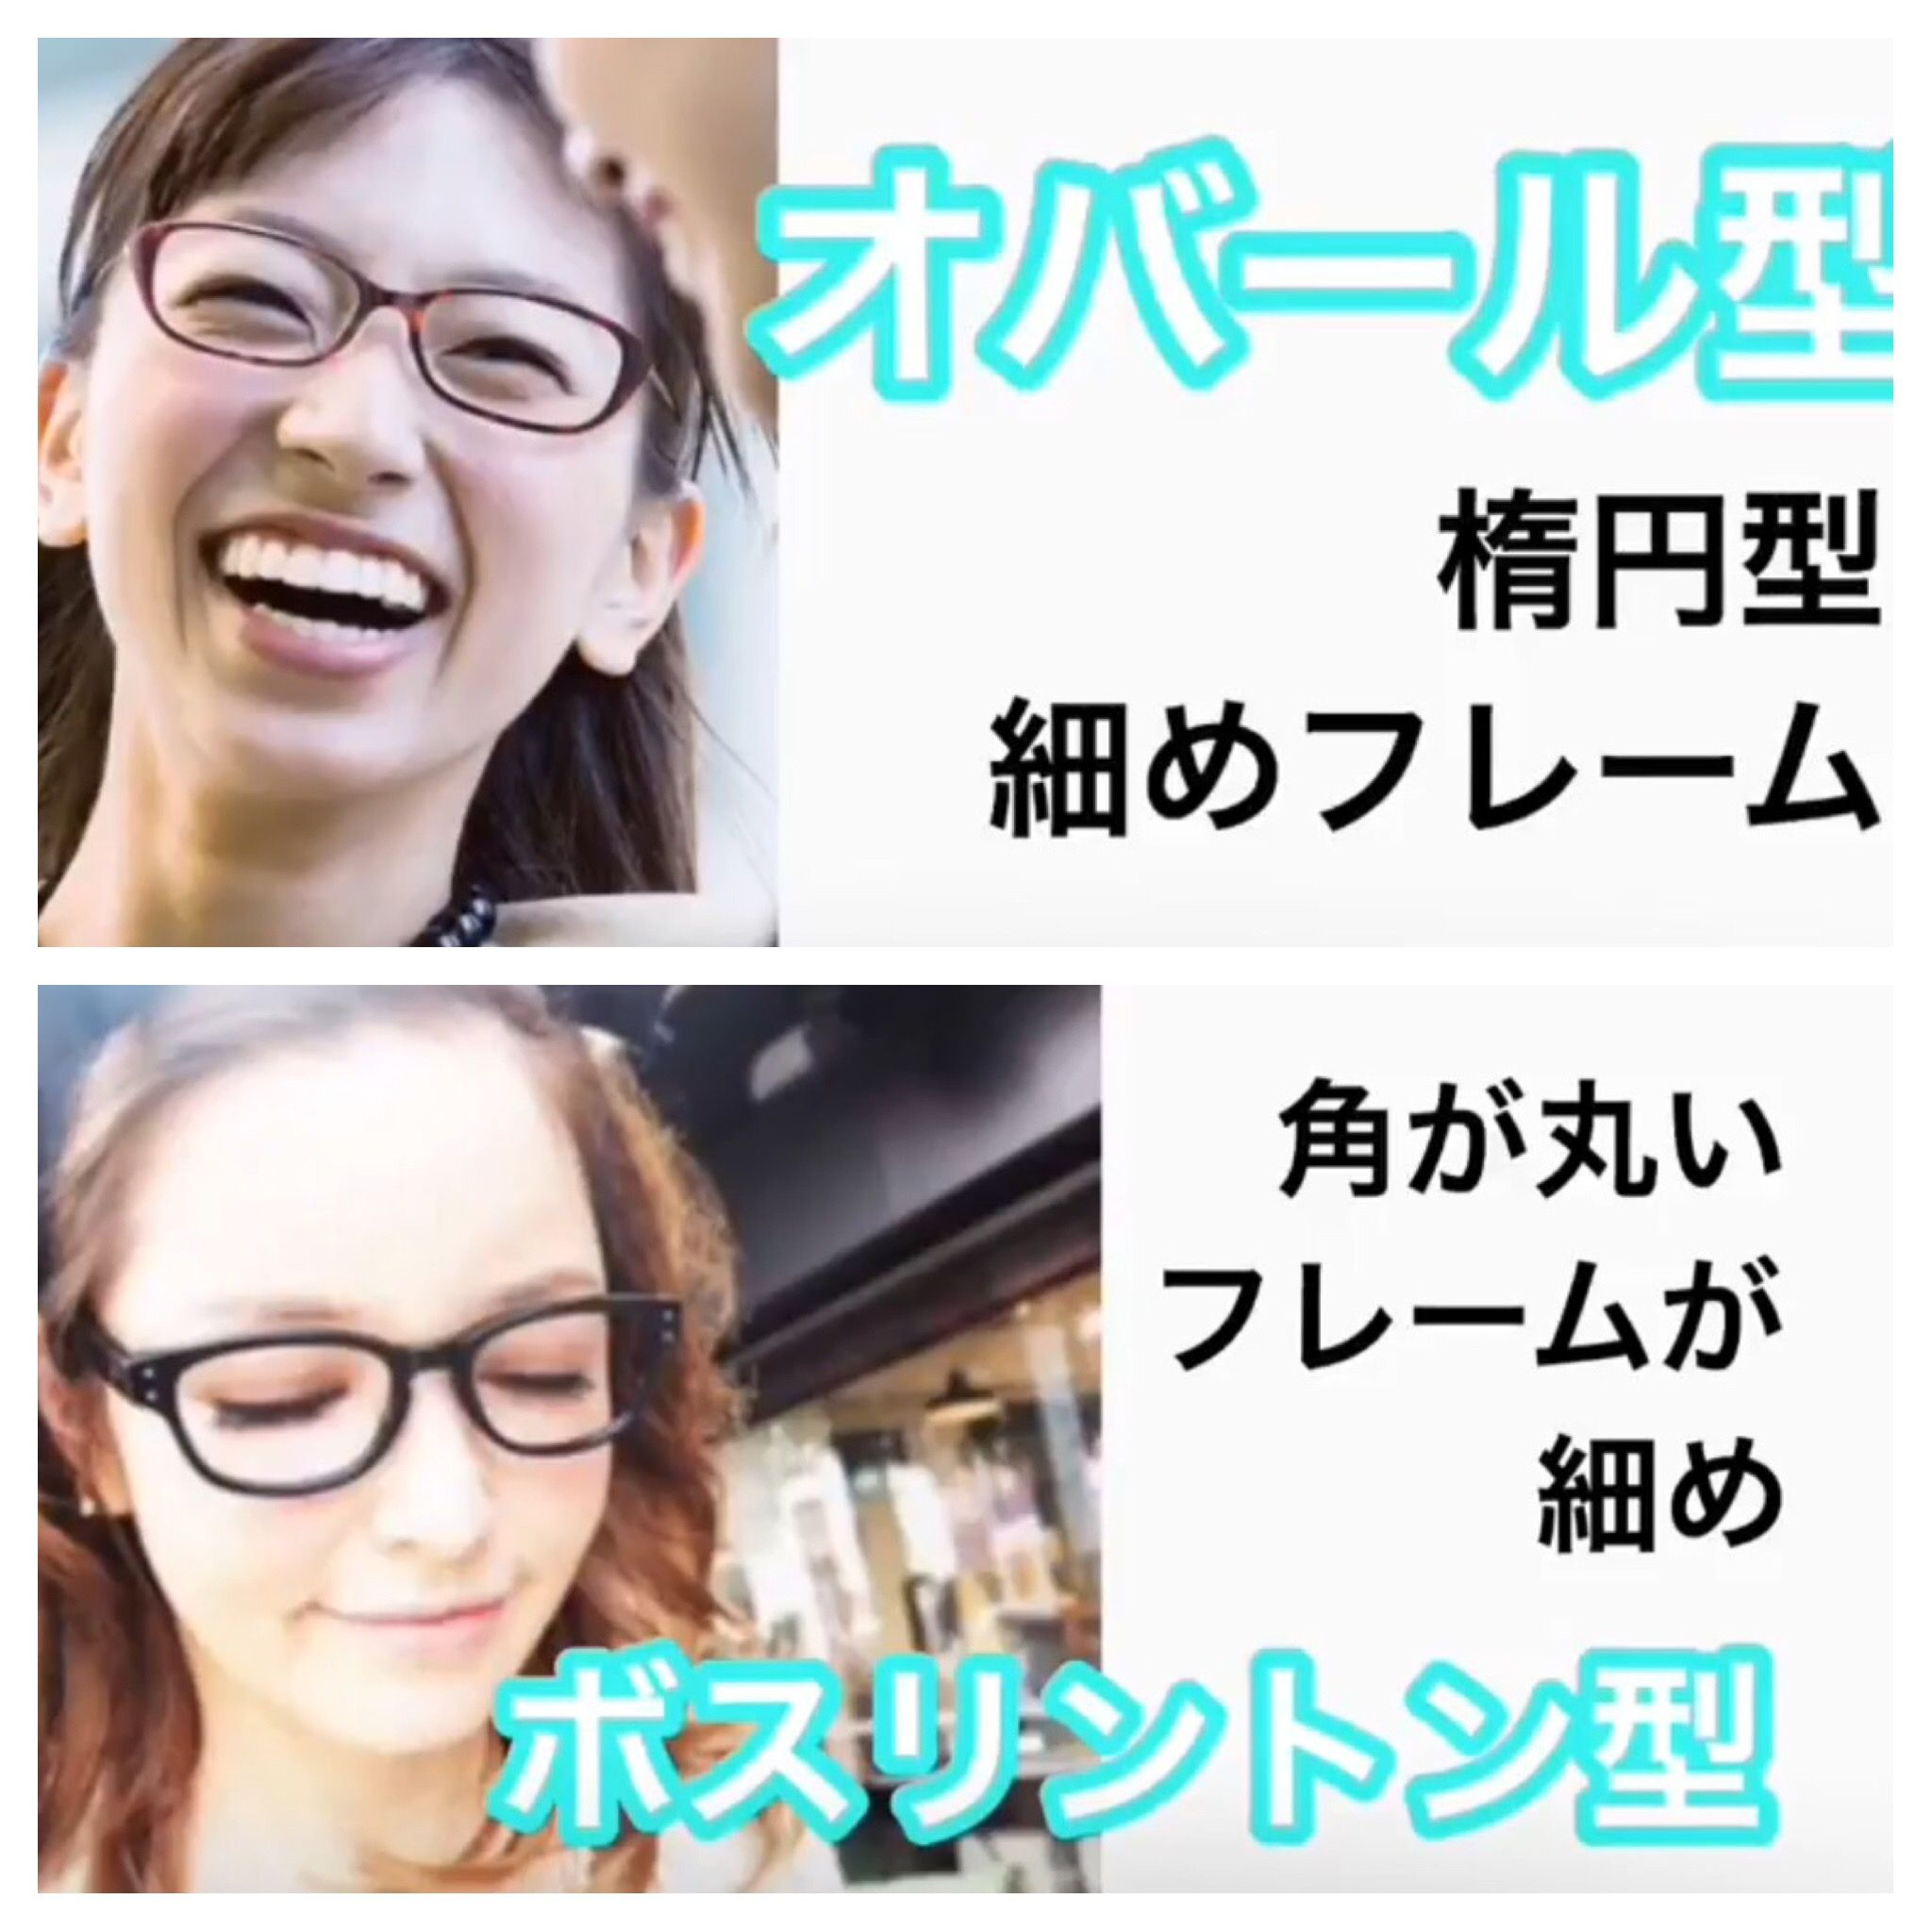 791ac2a5849494 骨格診断ウェーブに似合うメガネ …フレームが細くて丸みがあるものを選ぶ  ひよりスタイリングから引用。オバールじゃなくてオーバルの間違いだと思われ(-_-)